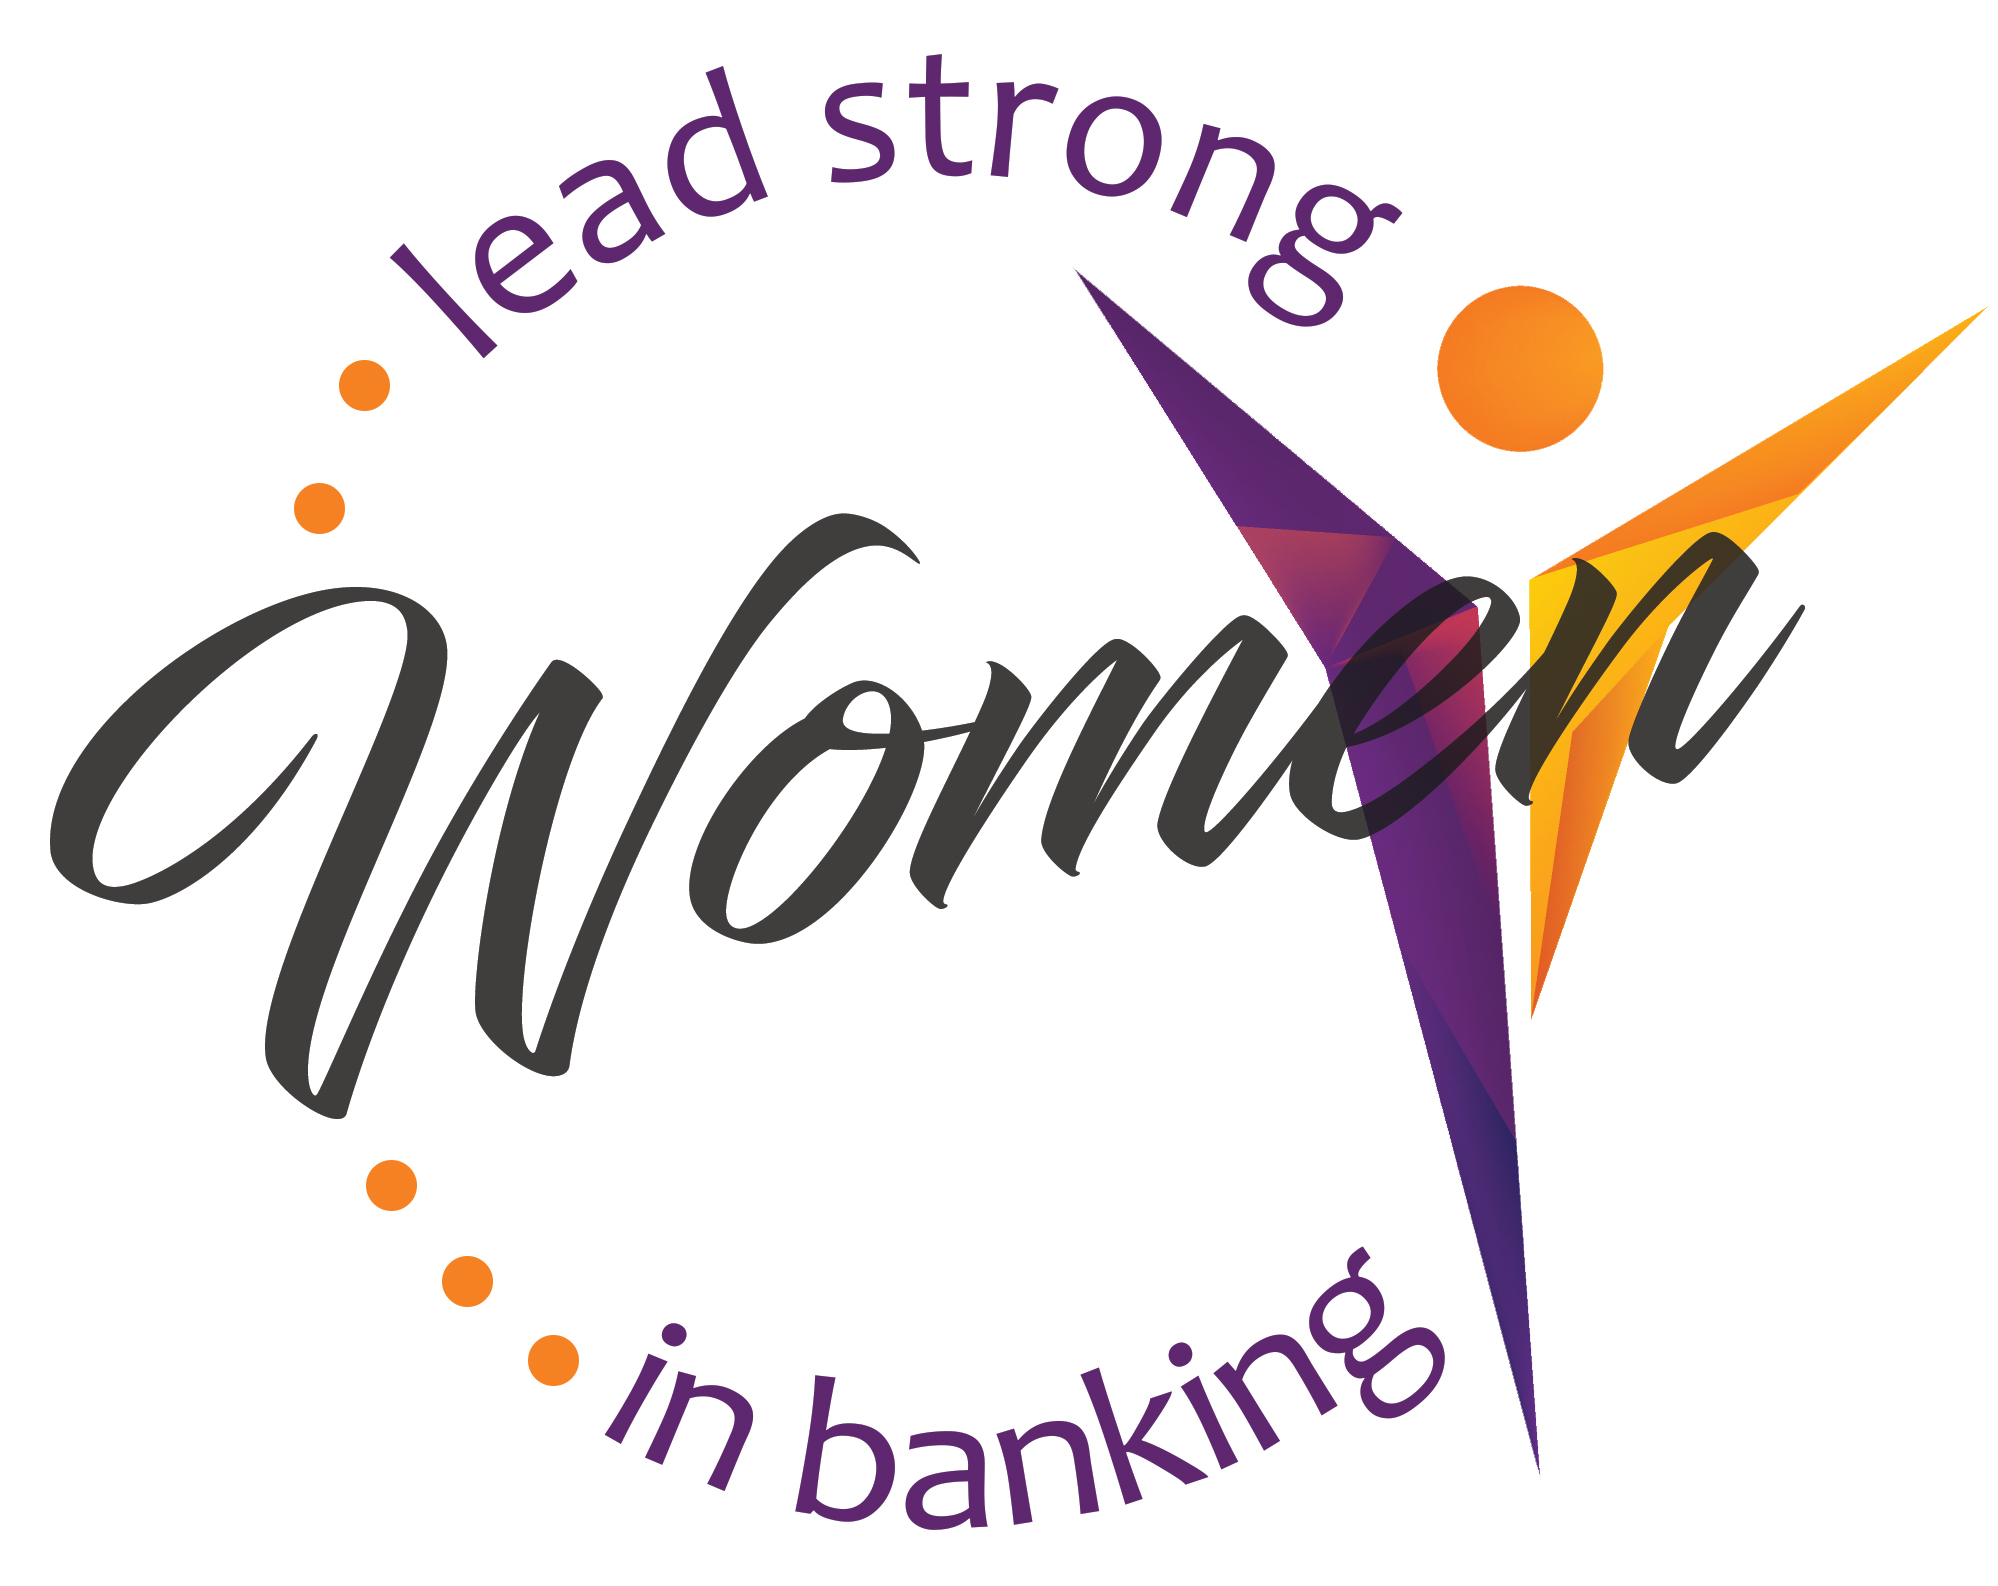 Lead Strong: Women in Banking